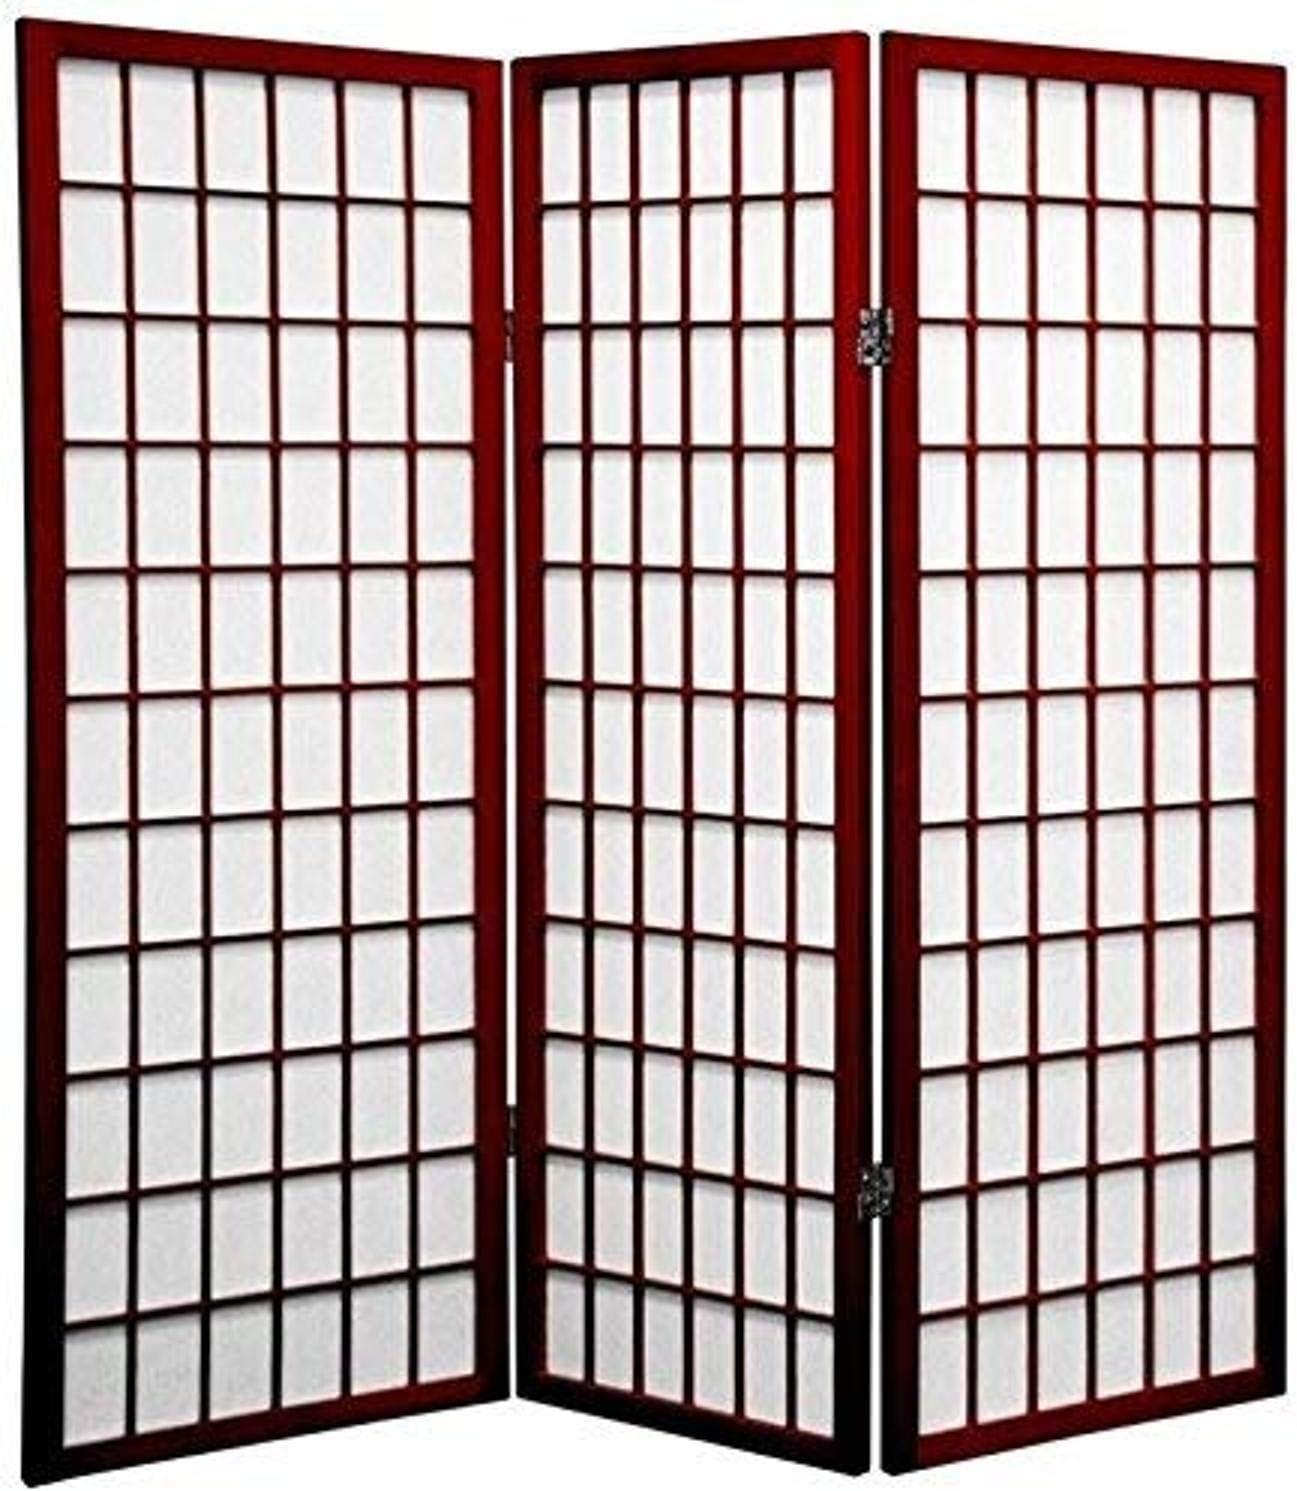 Oriental Furniture 4 ft. Tall Window Rosewoo Cheap Pane - Omaha Mall Shoji Screen